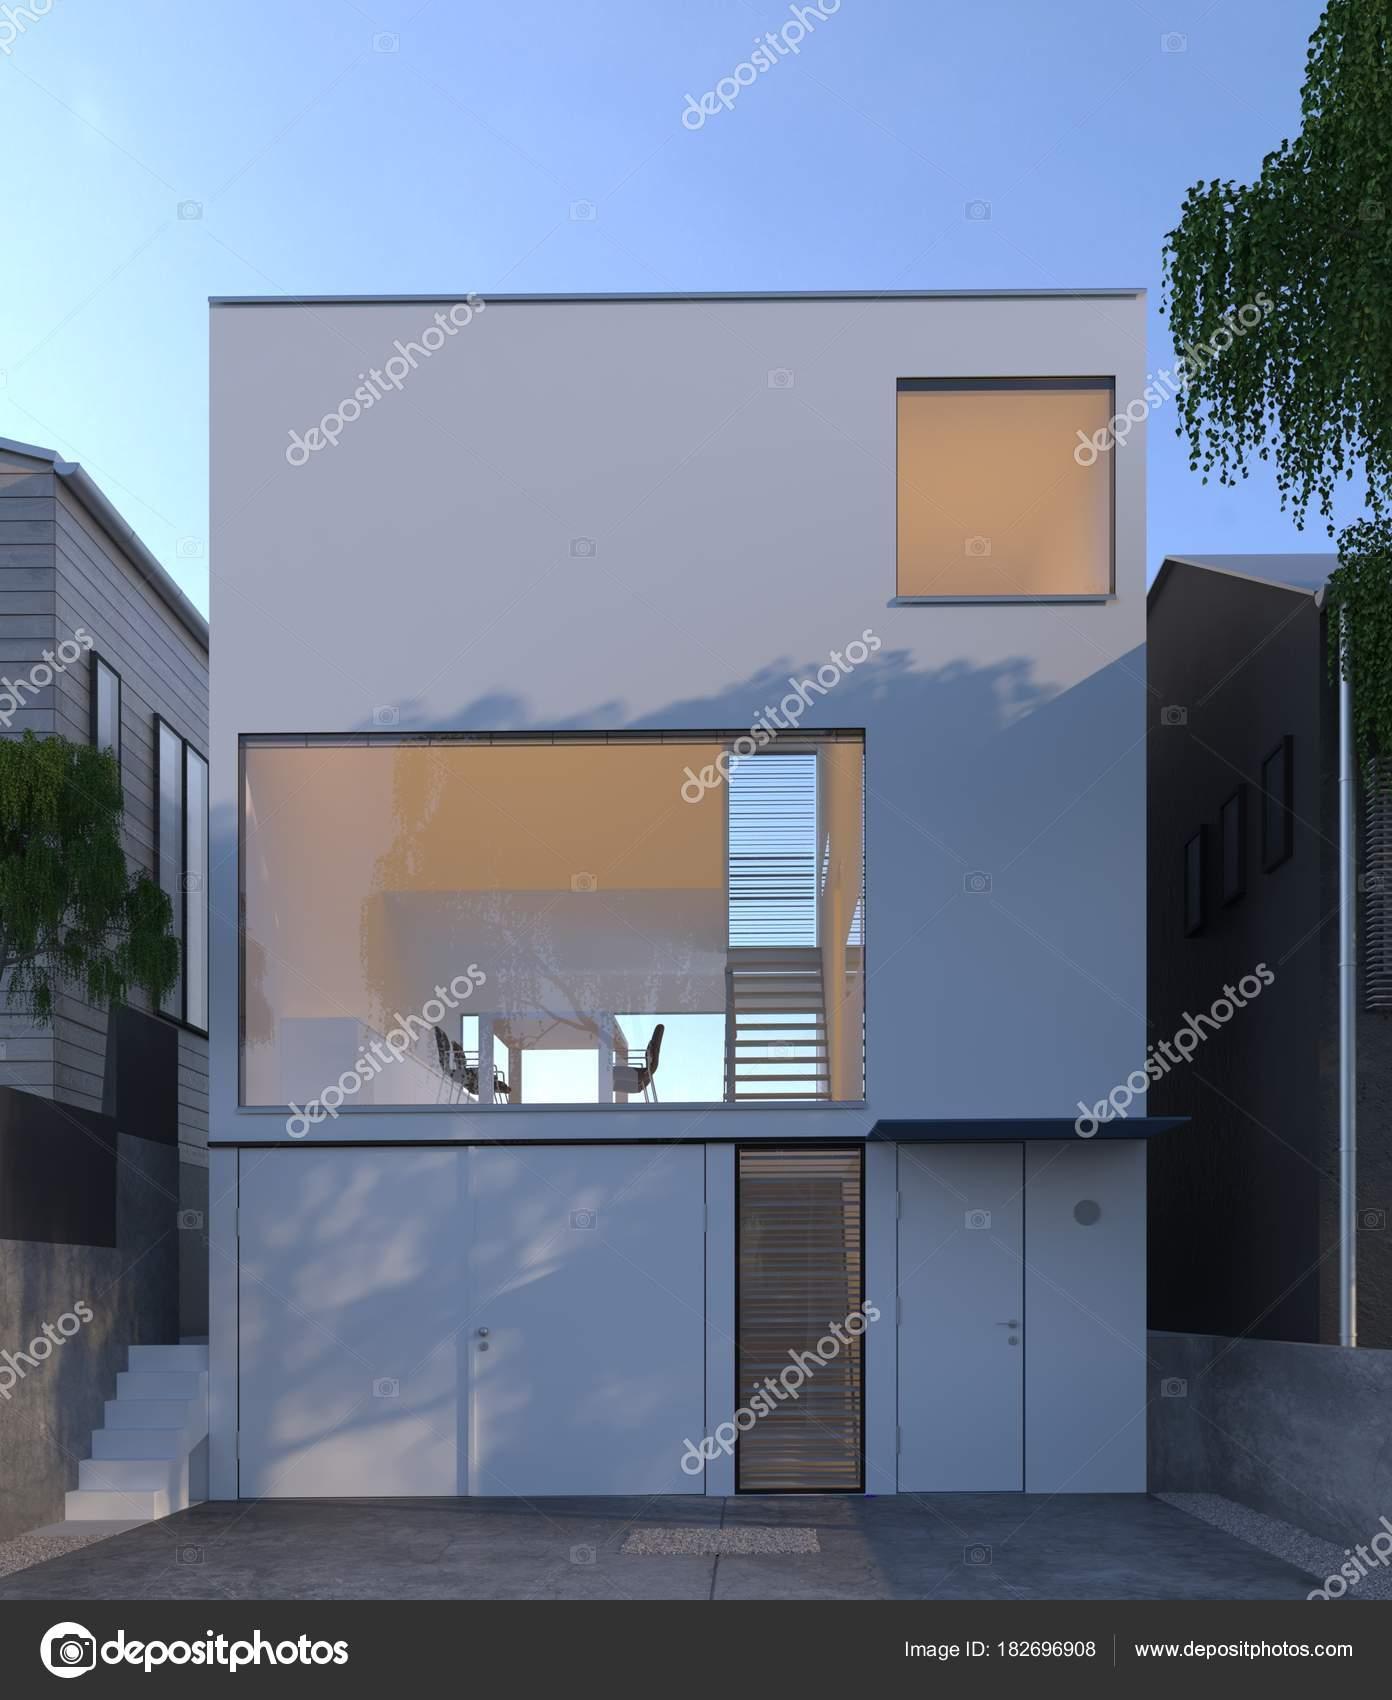 Japan House Minimal Architecture House Design Stock Photo C Golemi84 182696908